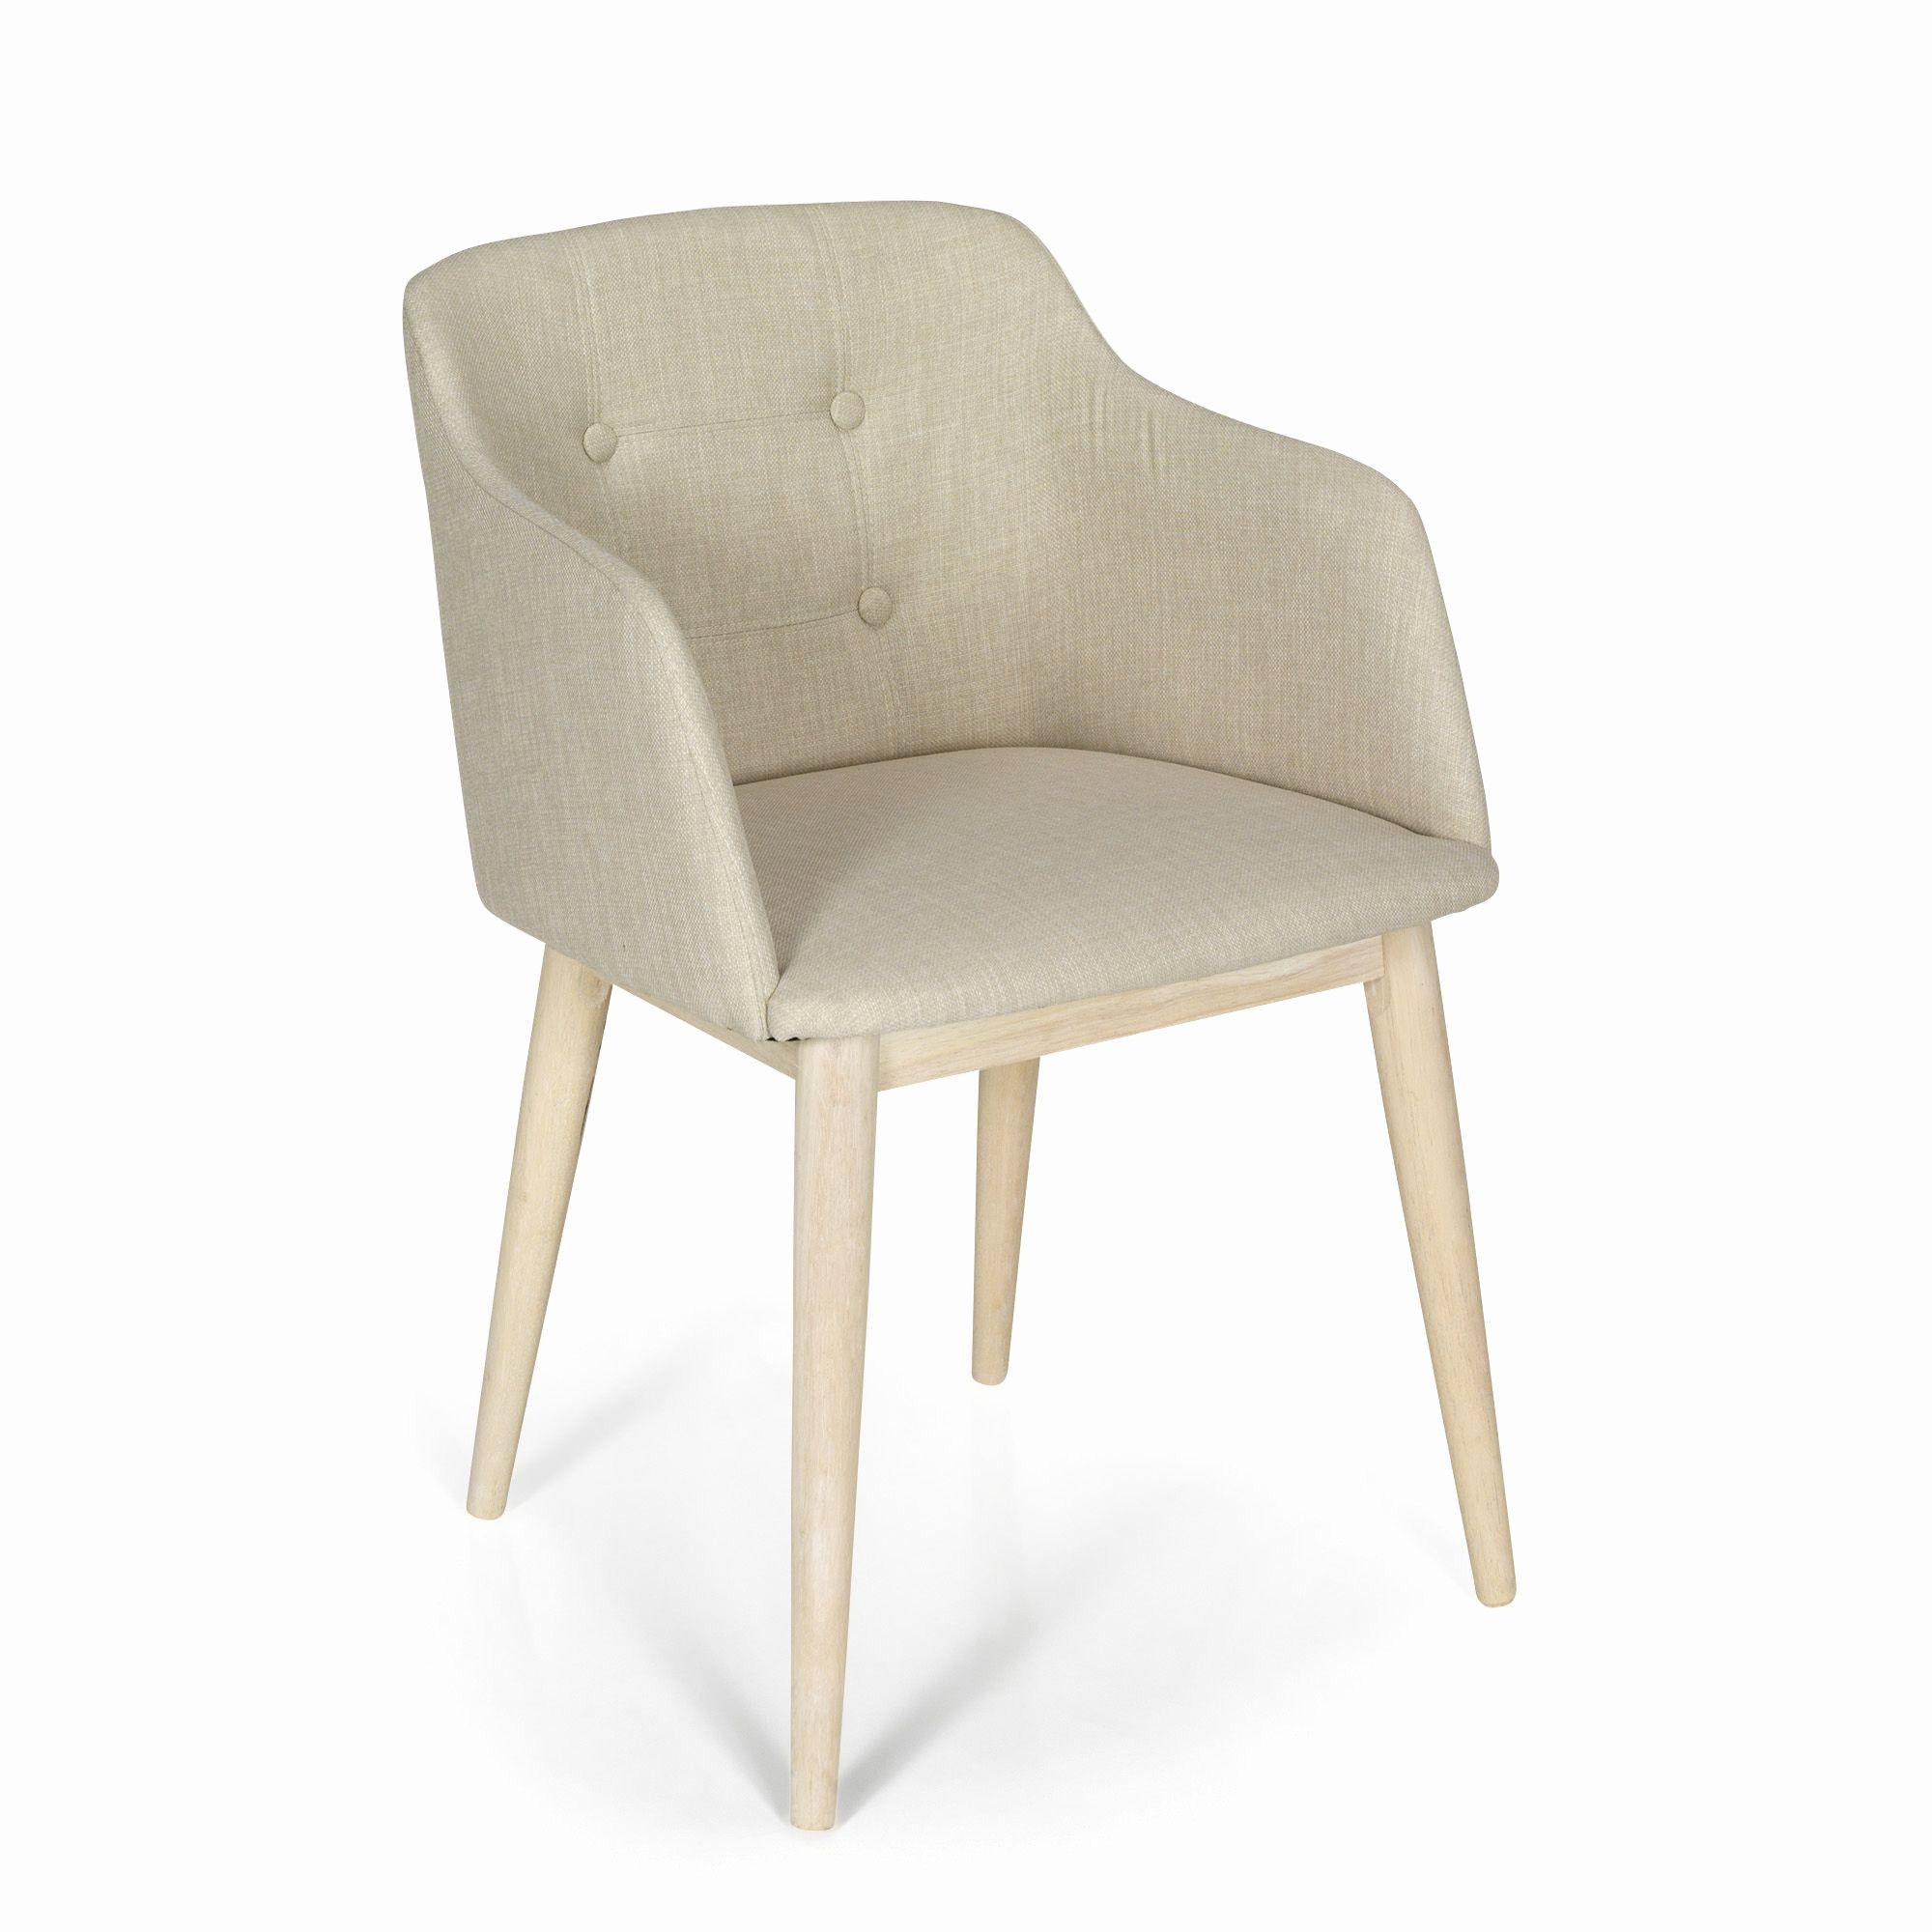 Lovely Fauteuil Beige Ikea Mobilier Furniture Contemporary Home Decor Home Decor Et Chair